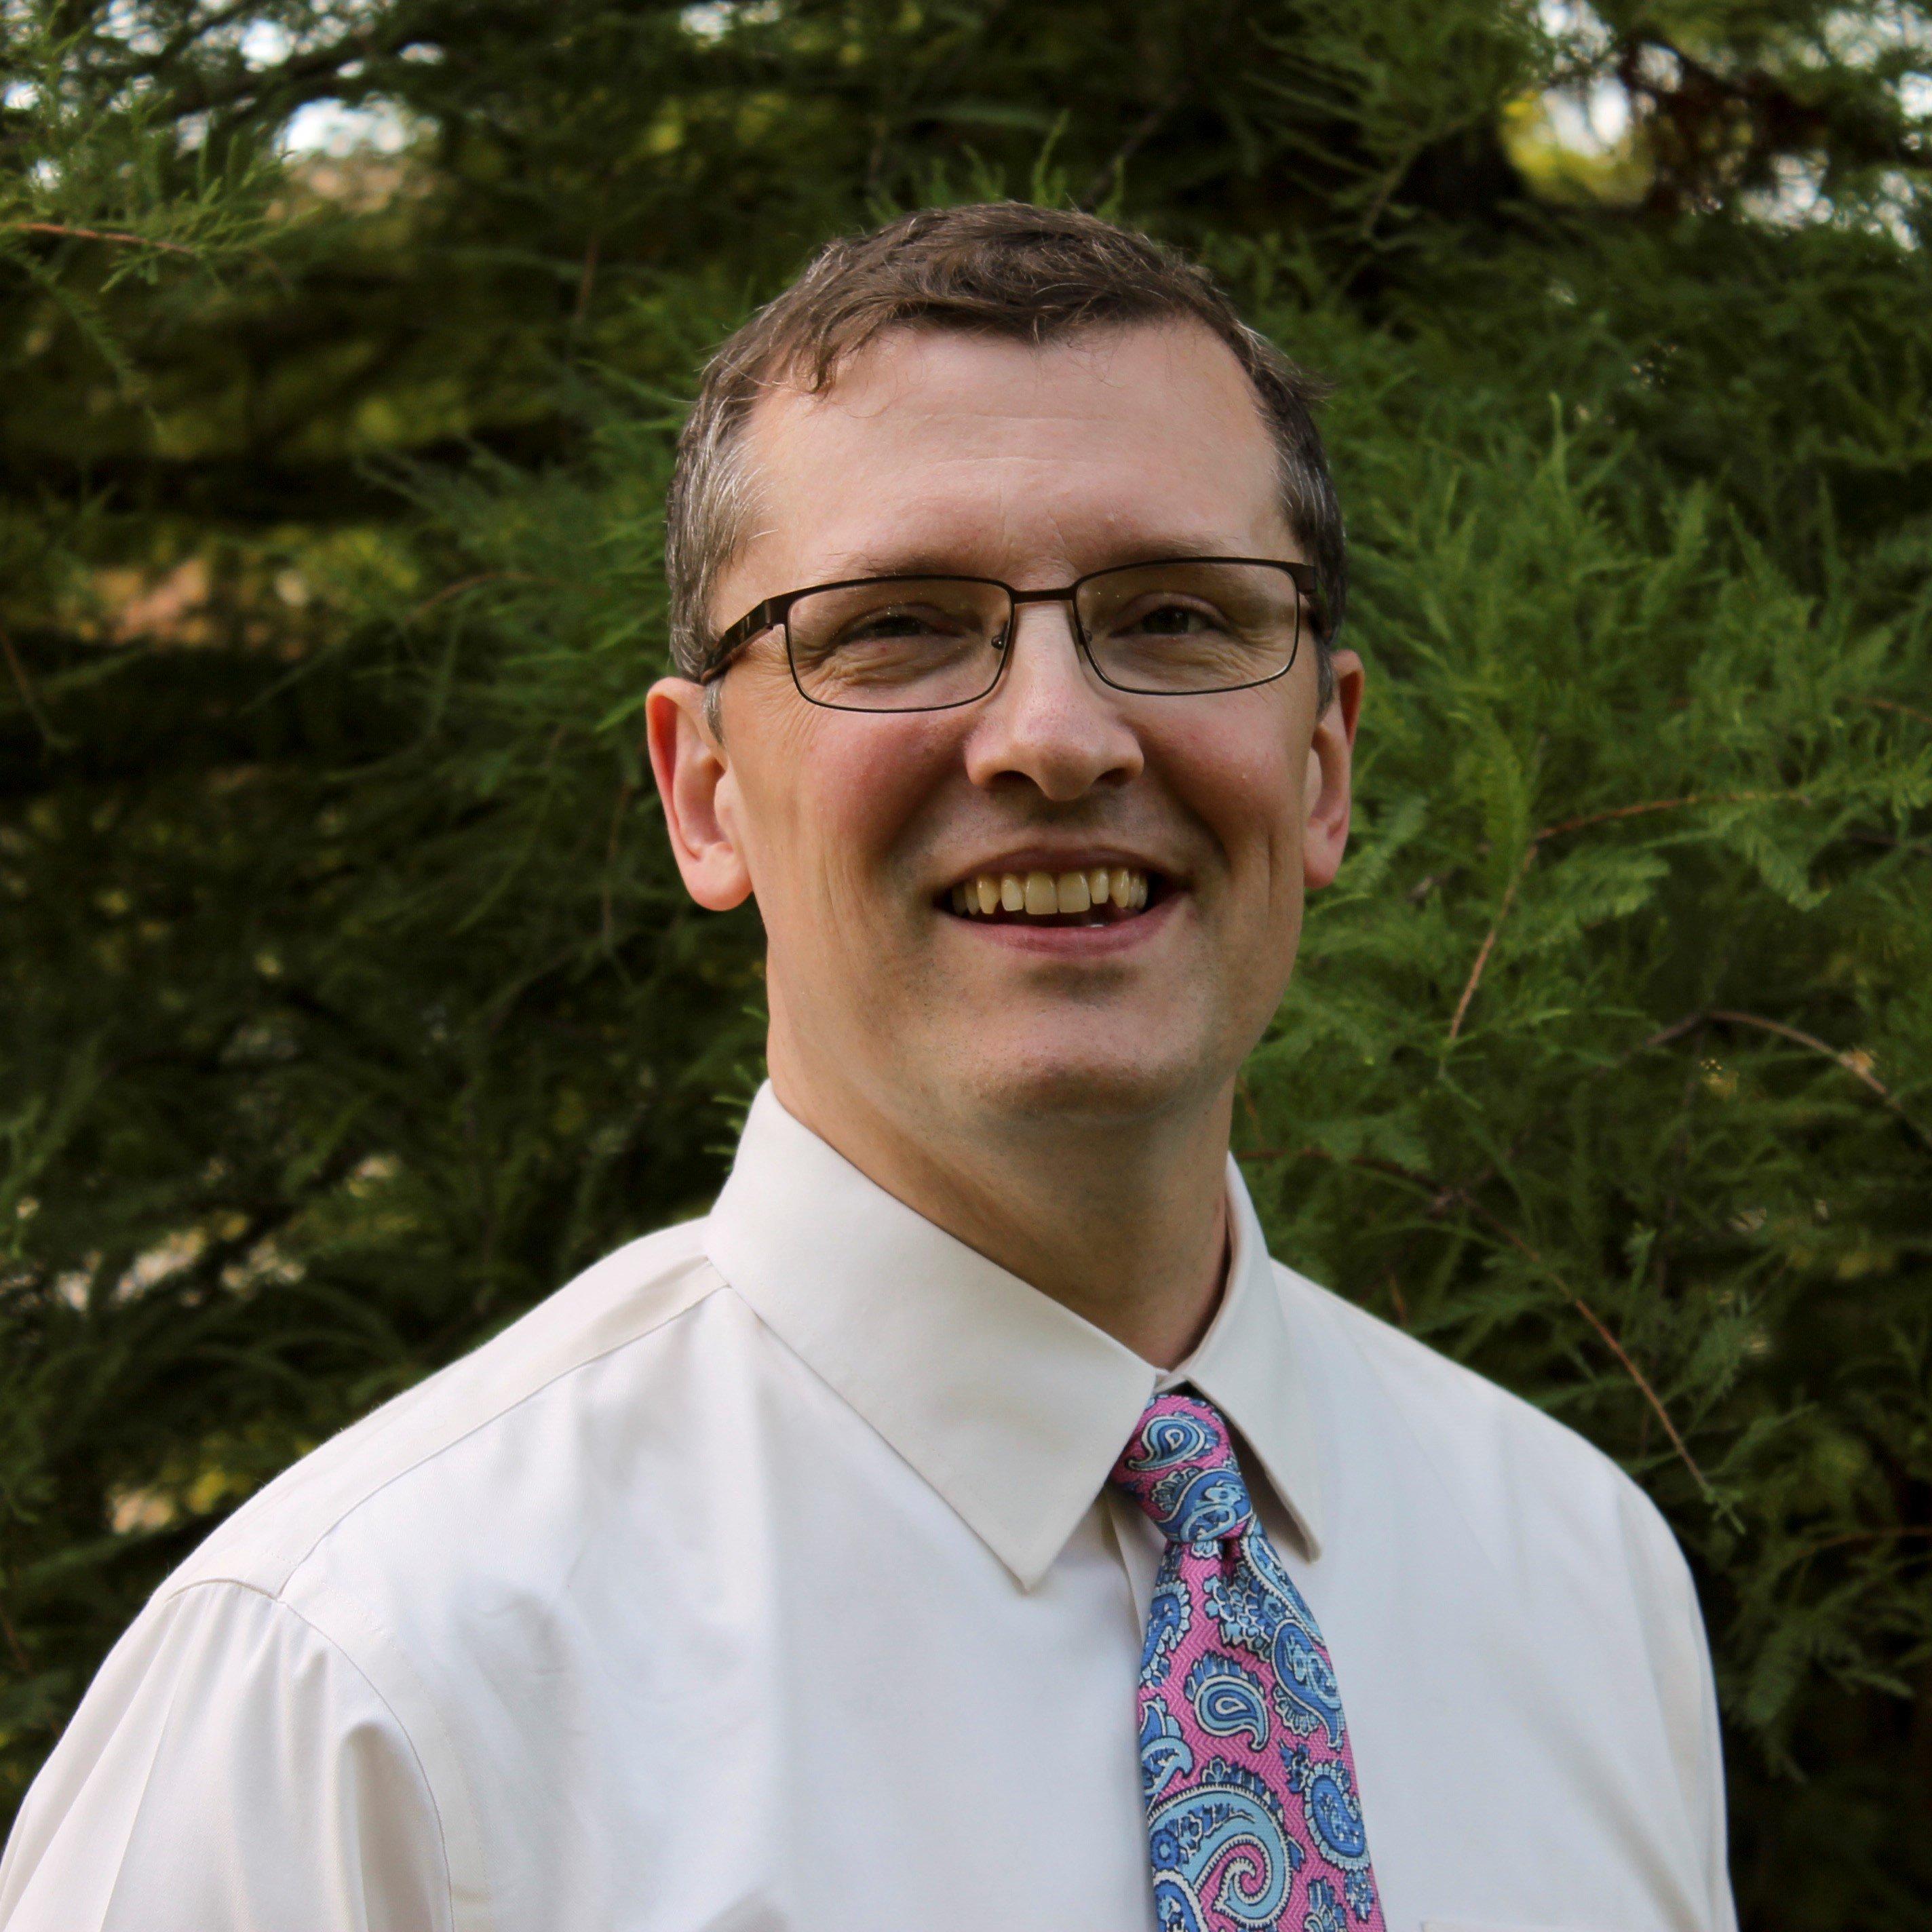 David Horton is the Upper School Mathematics Instructor at Clapham School